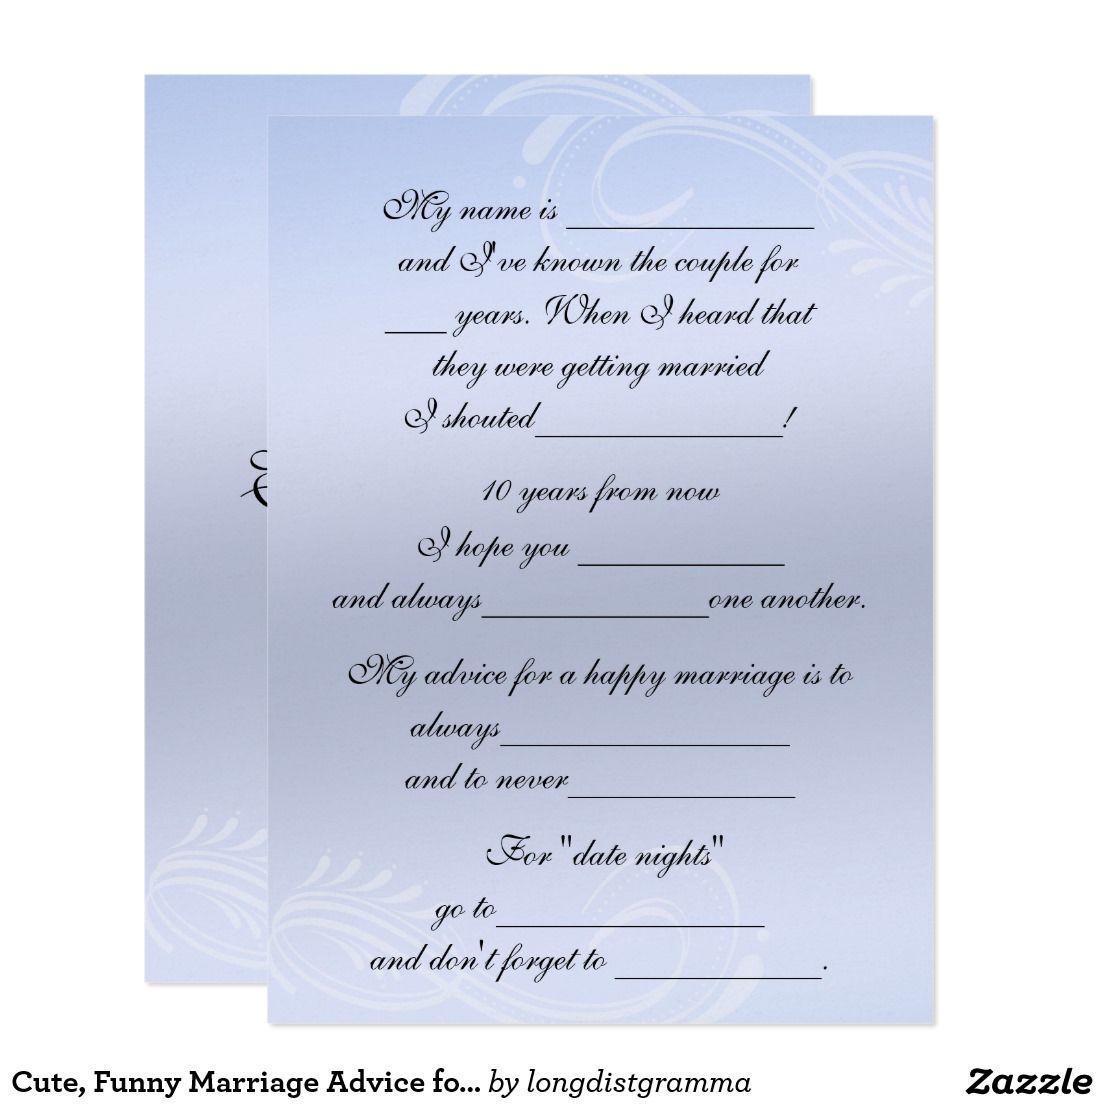 Cute Funny Marriage Advice For Bride Groom Zazzle Com In 2020 Funny Marriage Advice Groom Card Wedding Advice Cards